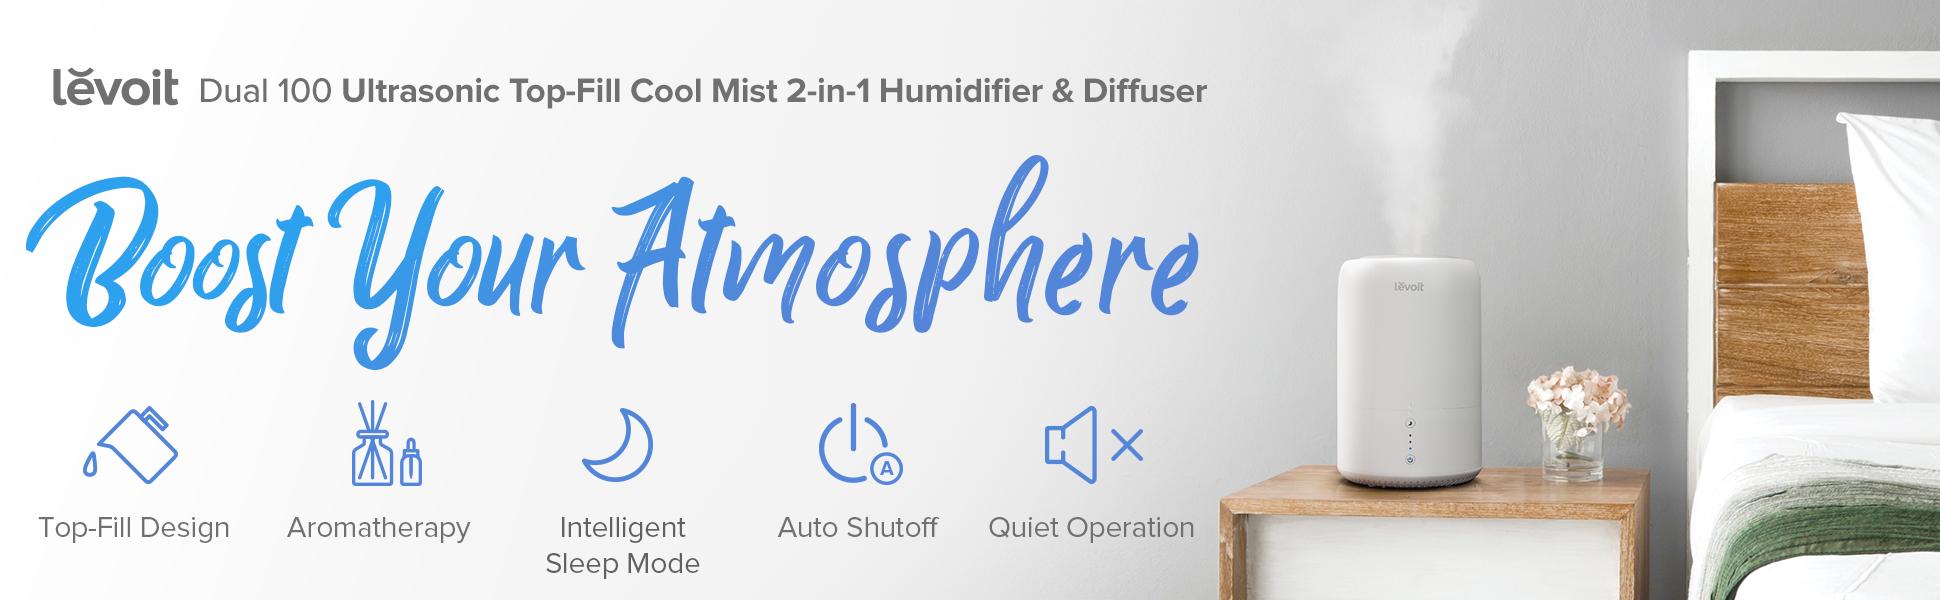 01.01_AP_HOHIHC21EL_Dual100_Ultrasonic-Top-Fill-Cool-Mist-2in1-Humidifier-Diffuser_01.jpg